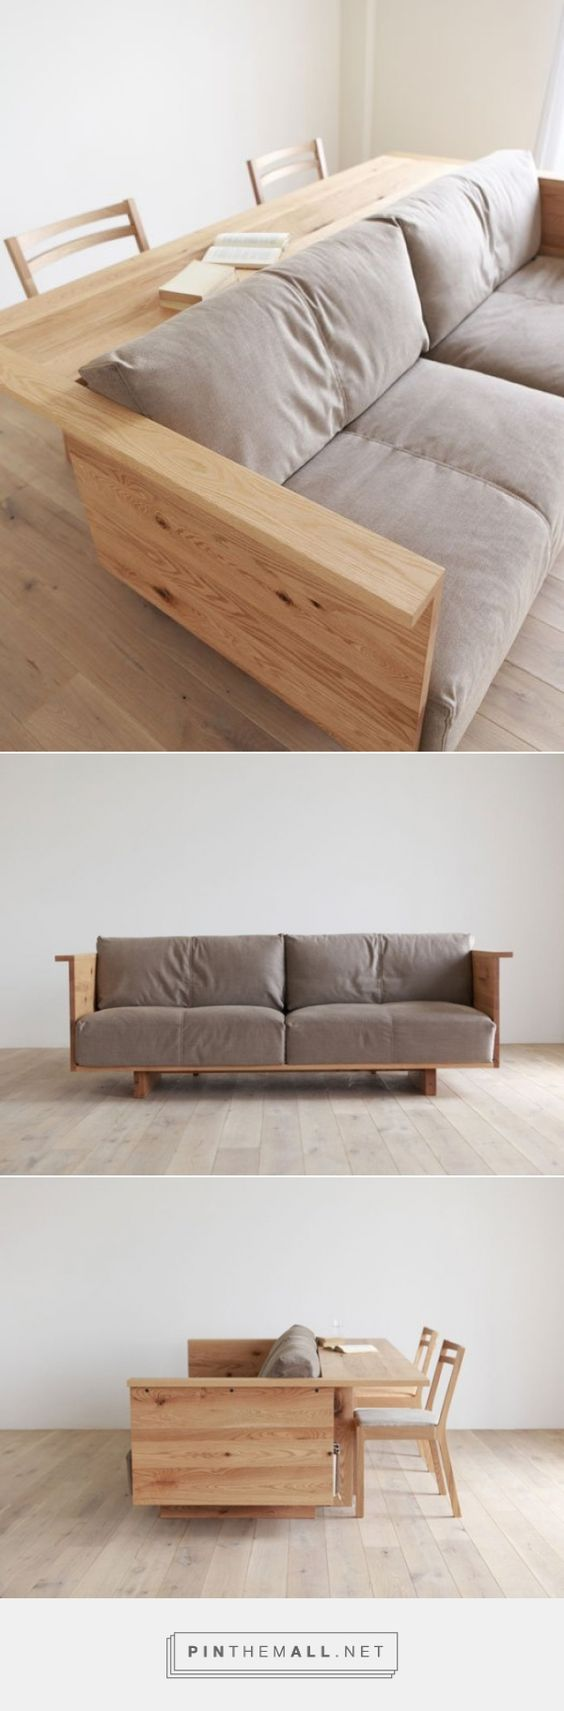 25 multi functional furniture design inspiration the for Furniture design inspiration